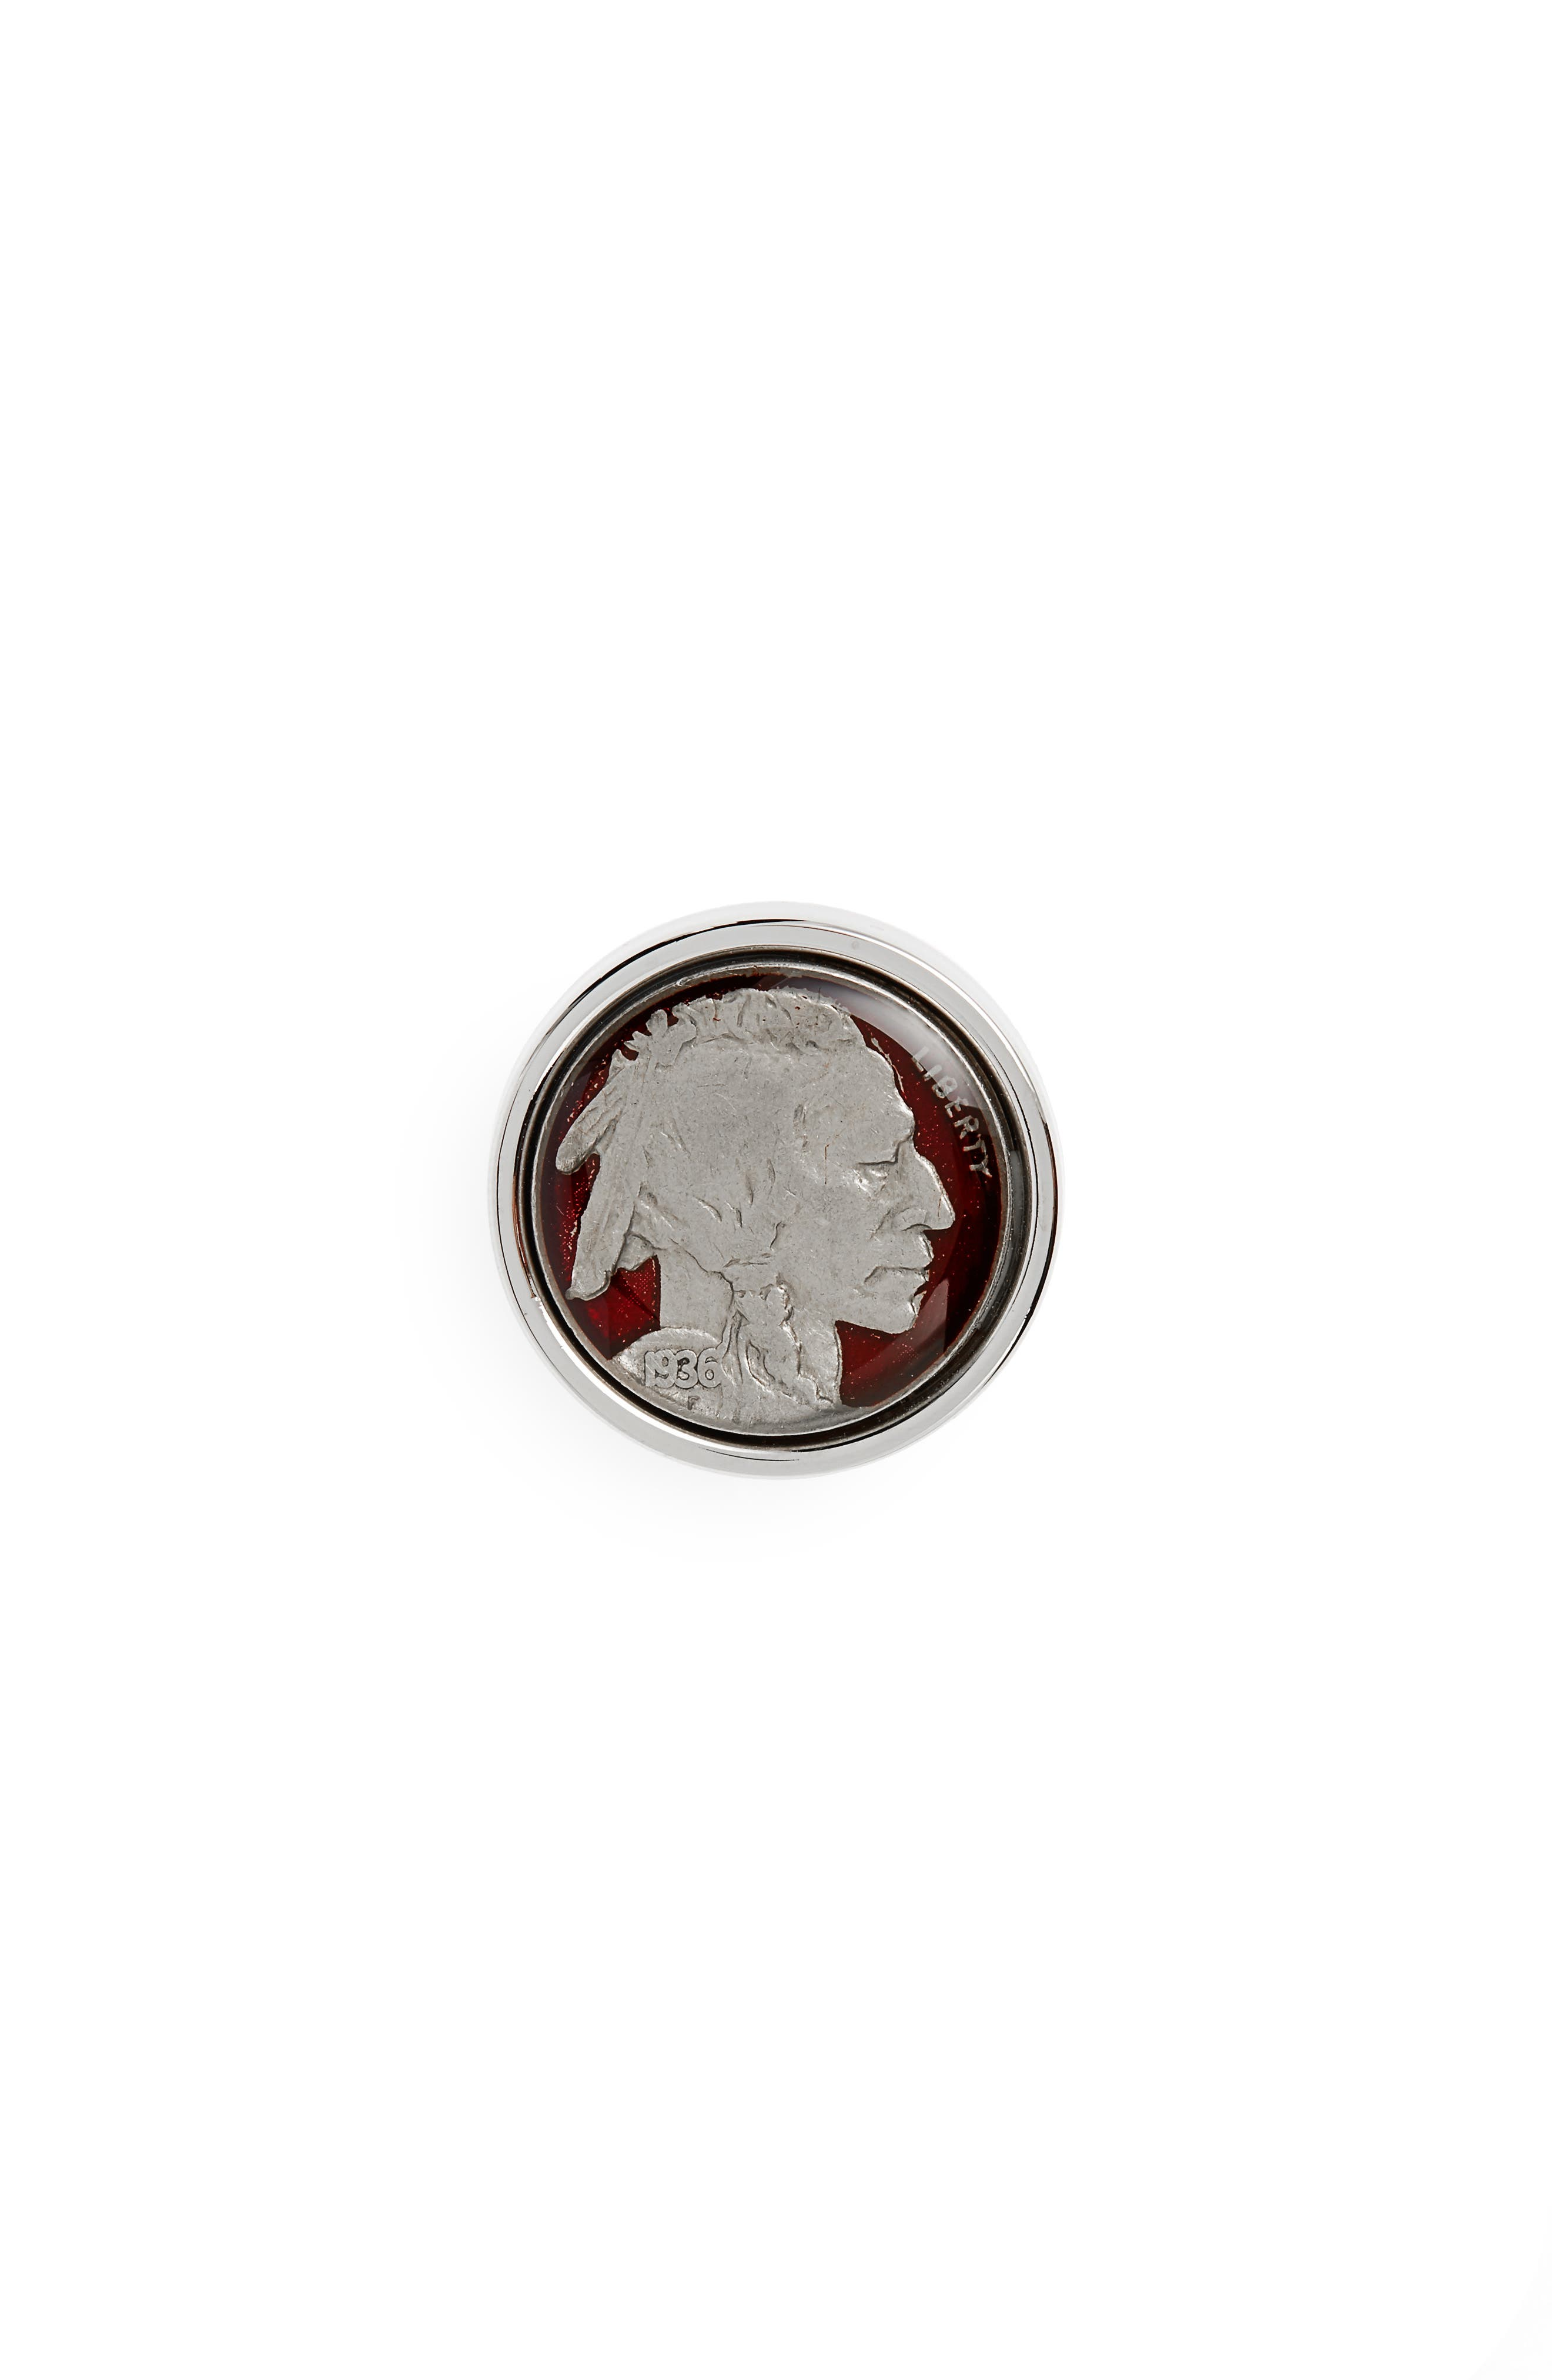 David Donahue Nickel Lapel Pin